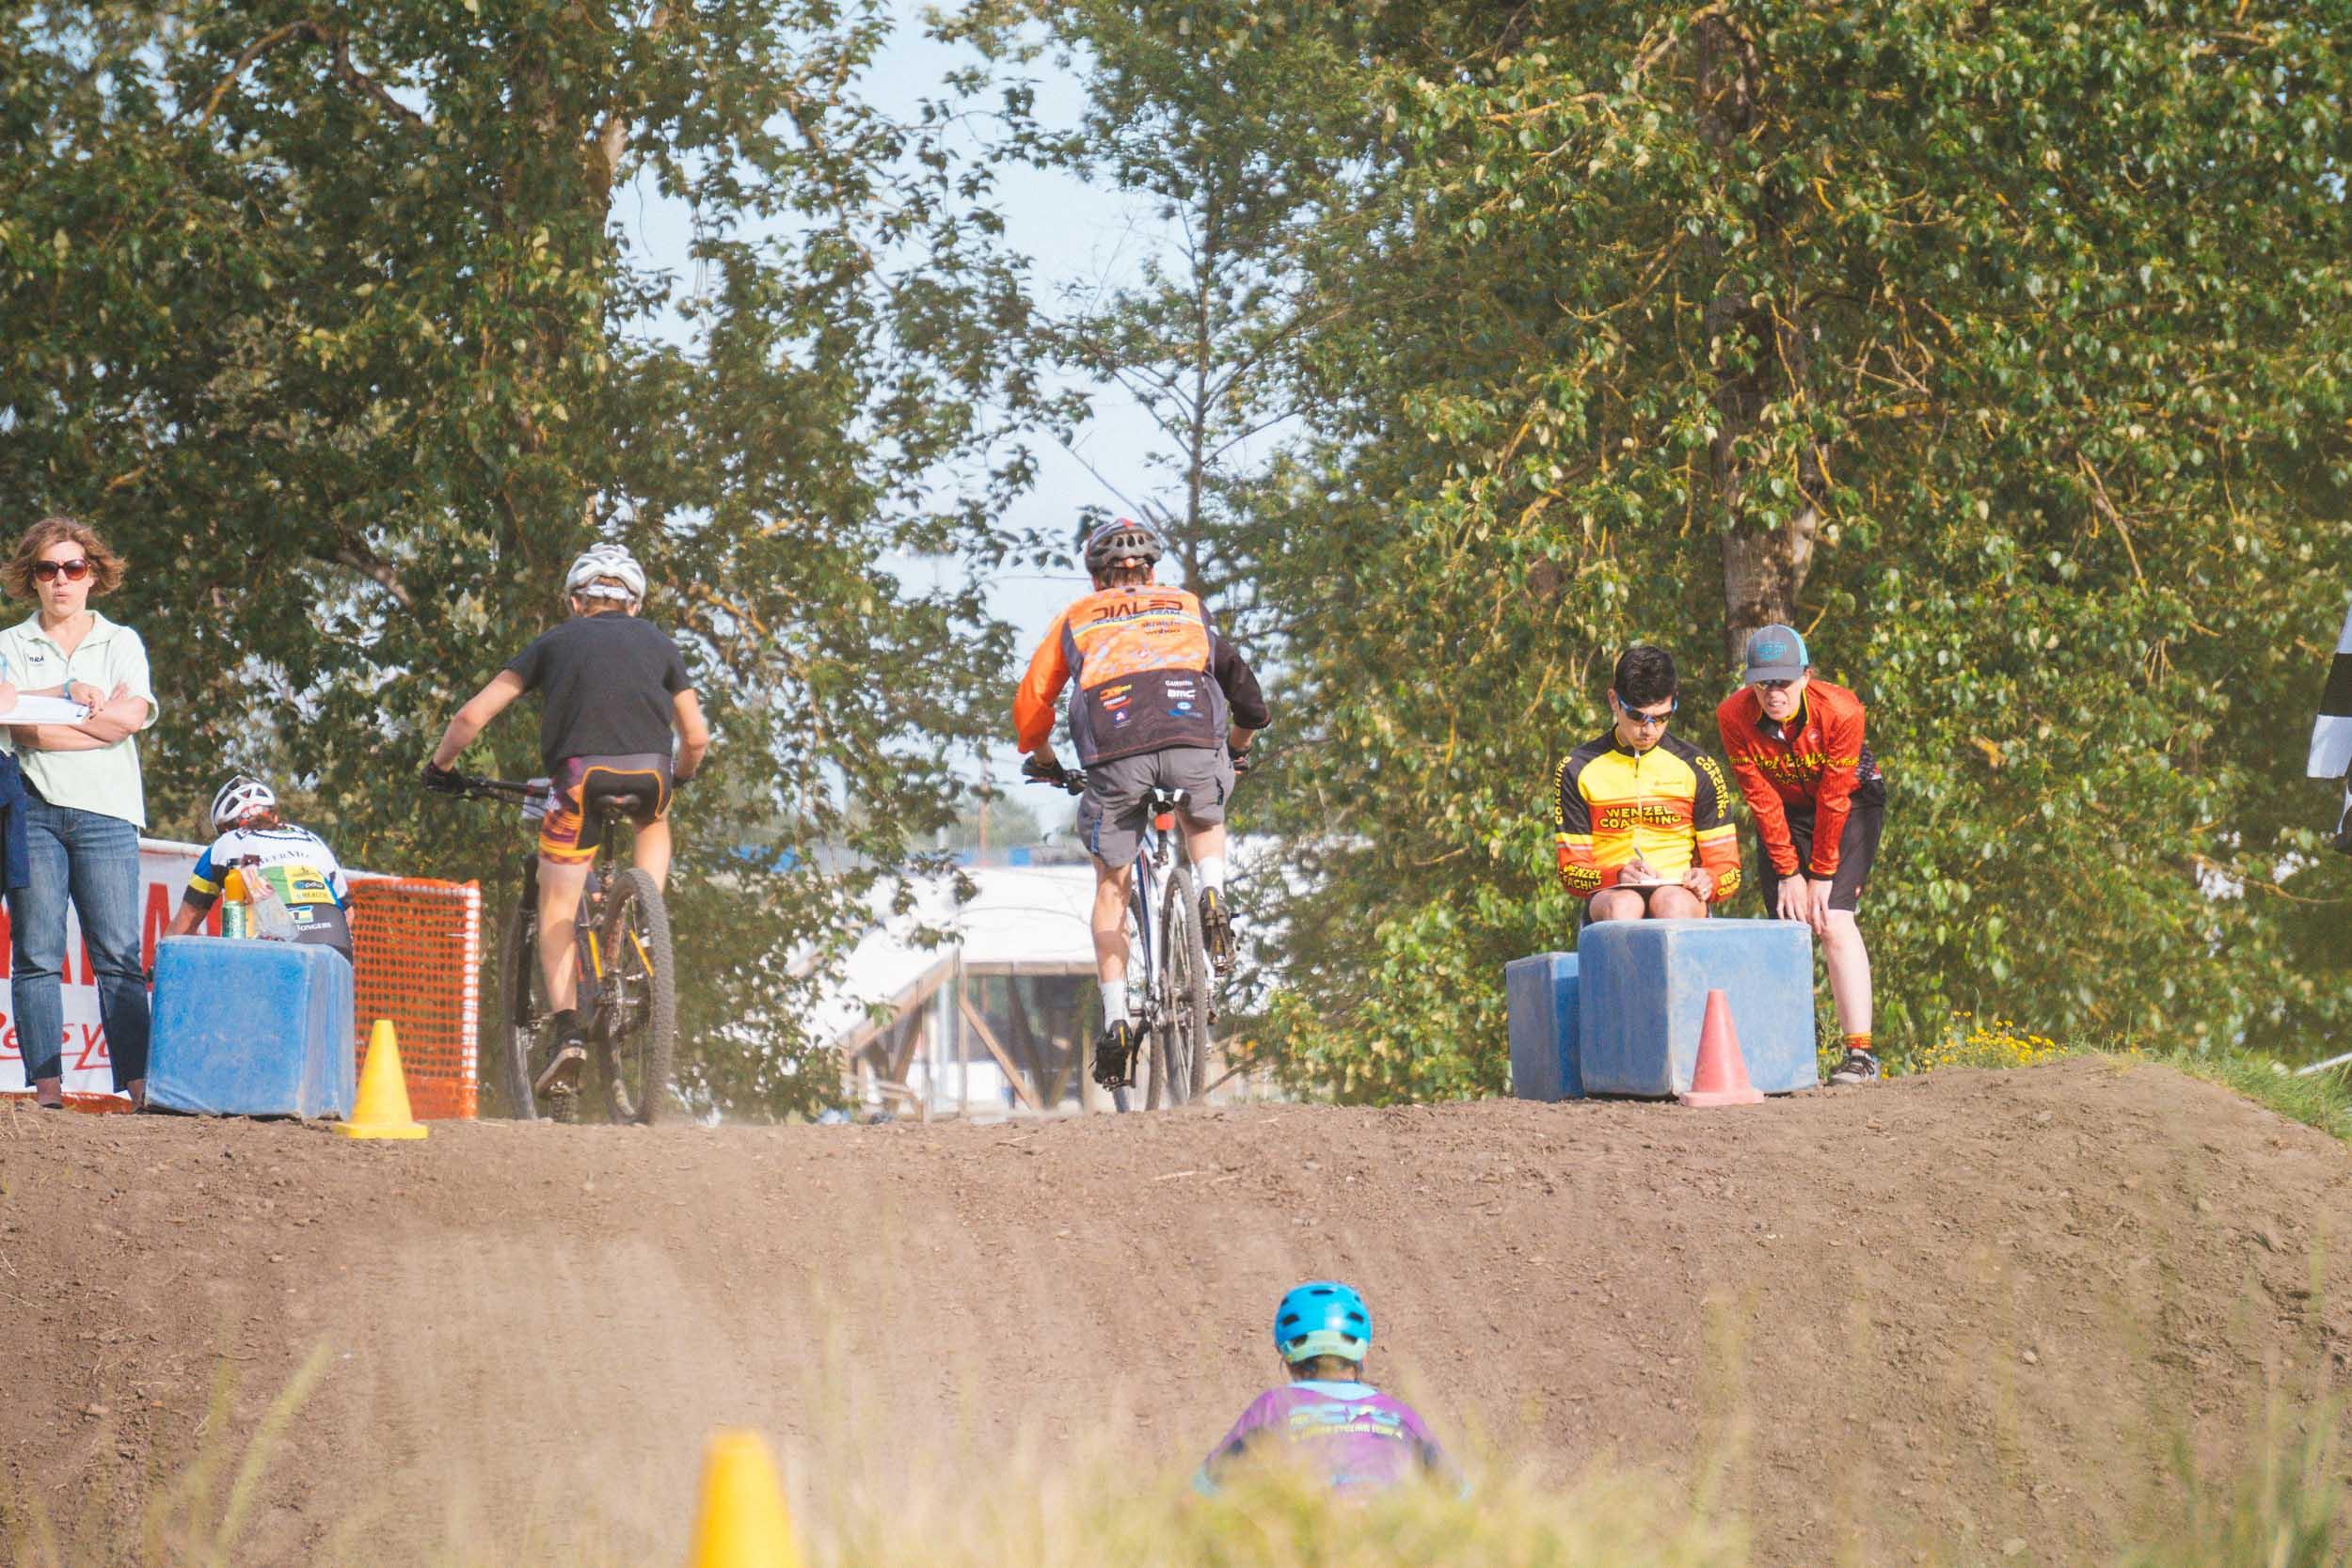 2018_Portland_ShortTrack_Race1_48.jpg